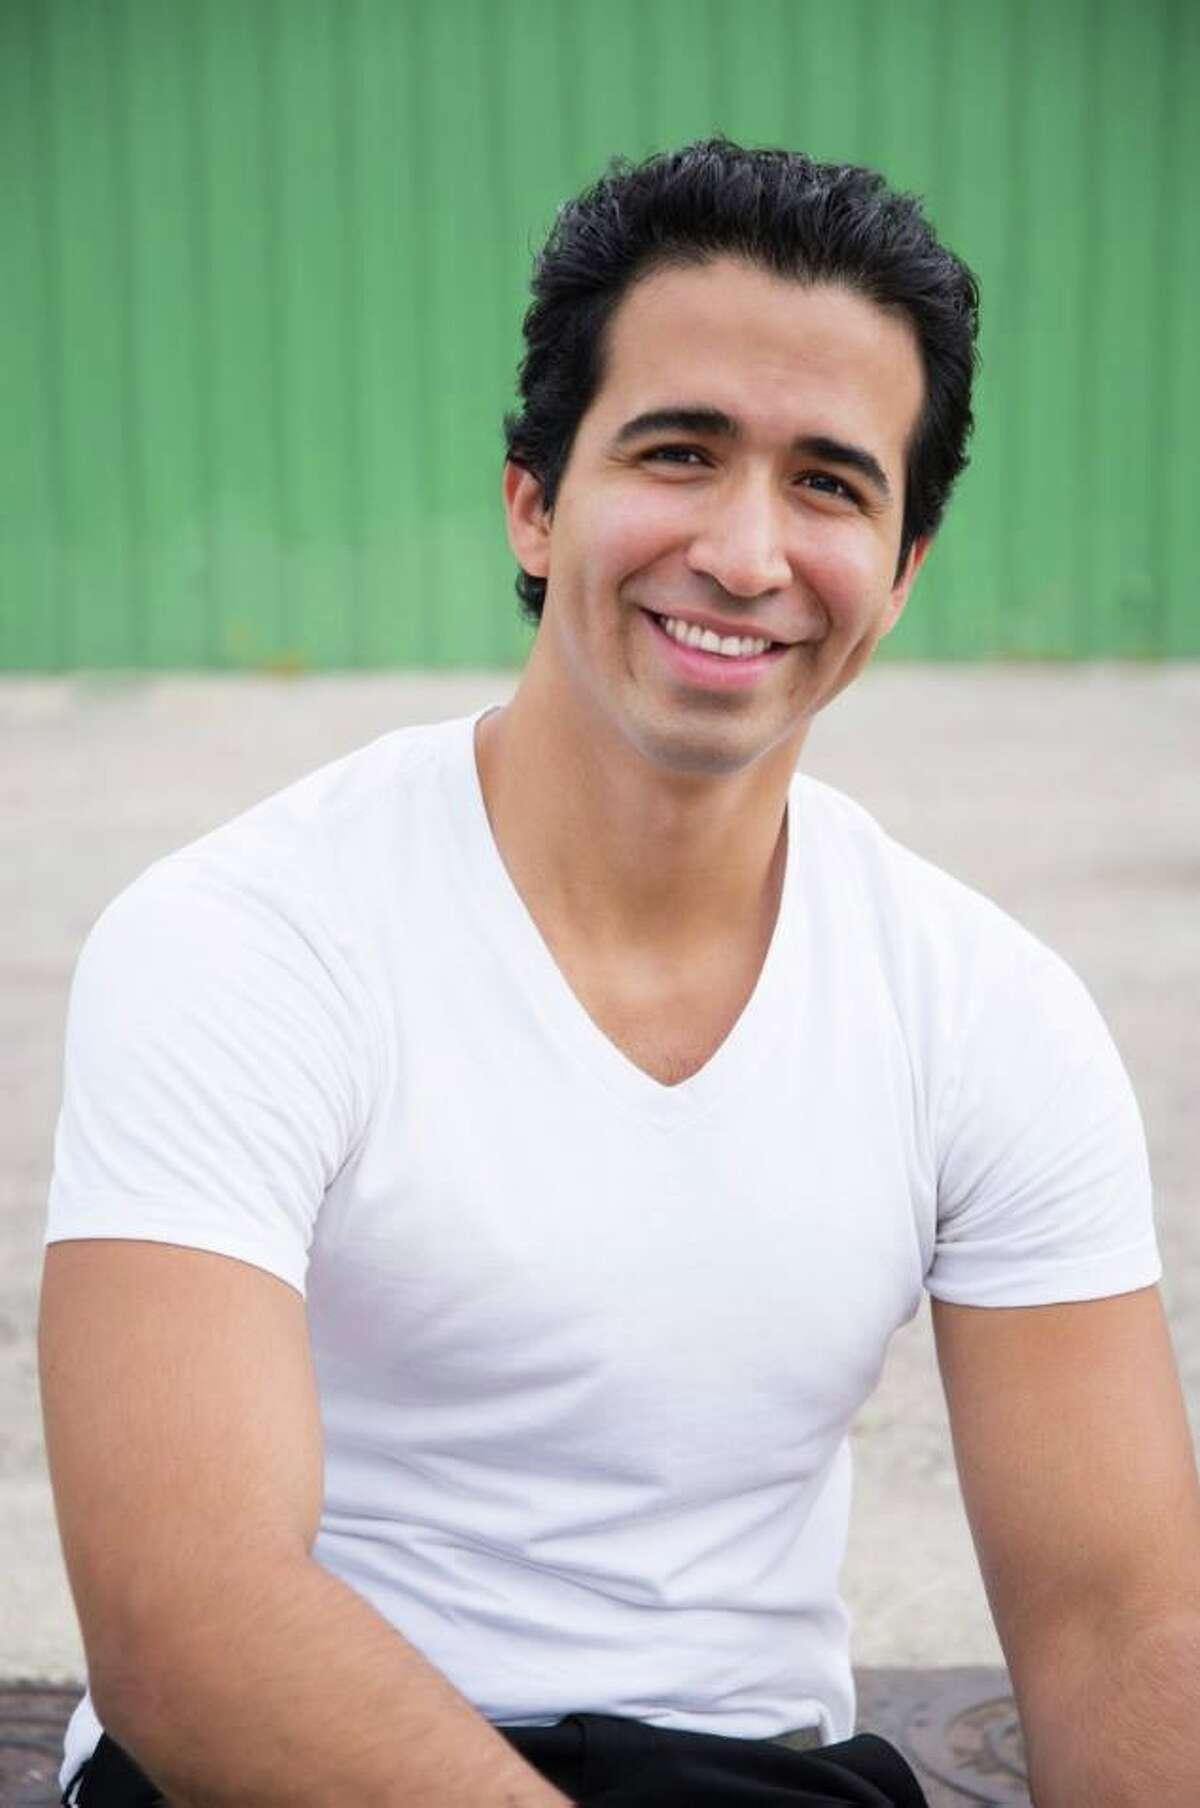 Tenor Rafael Moras is a graduate student in Rice University's Shepherd School of Music.